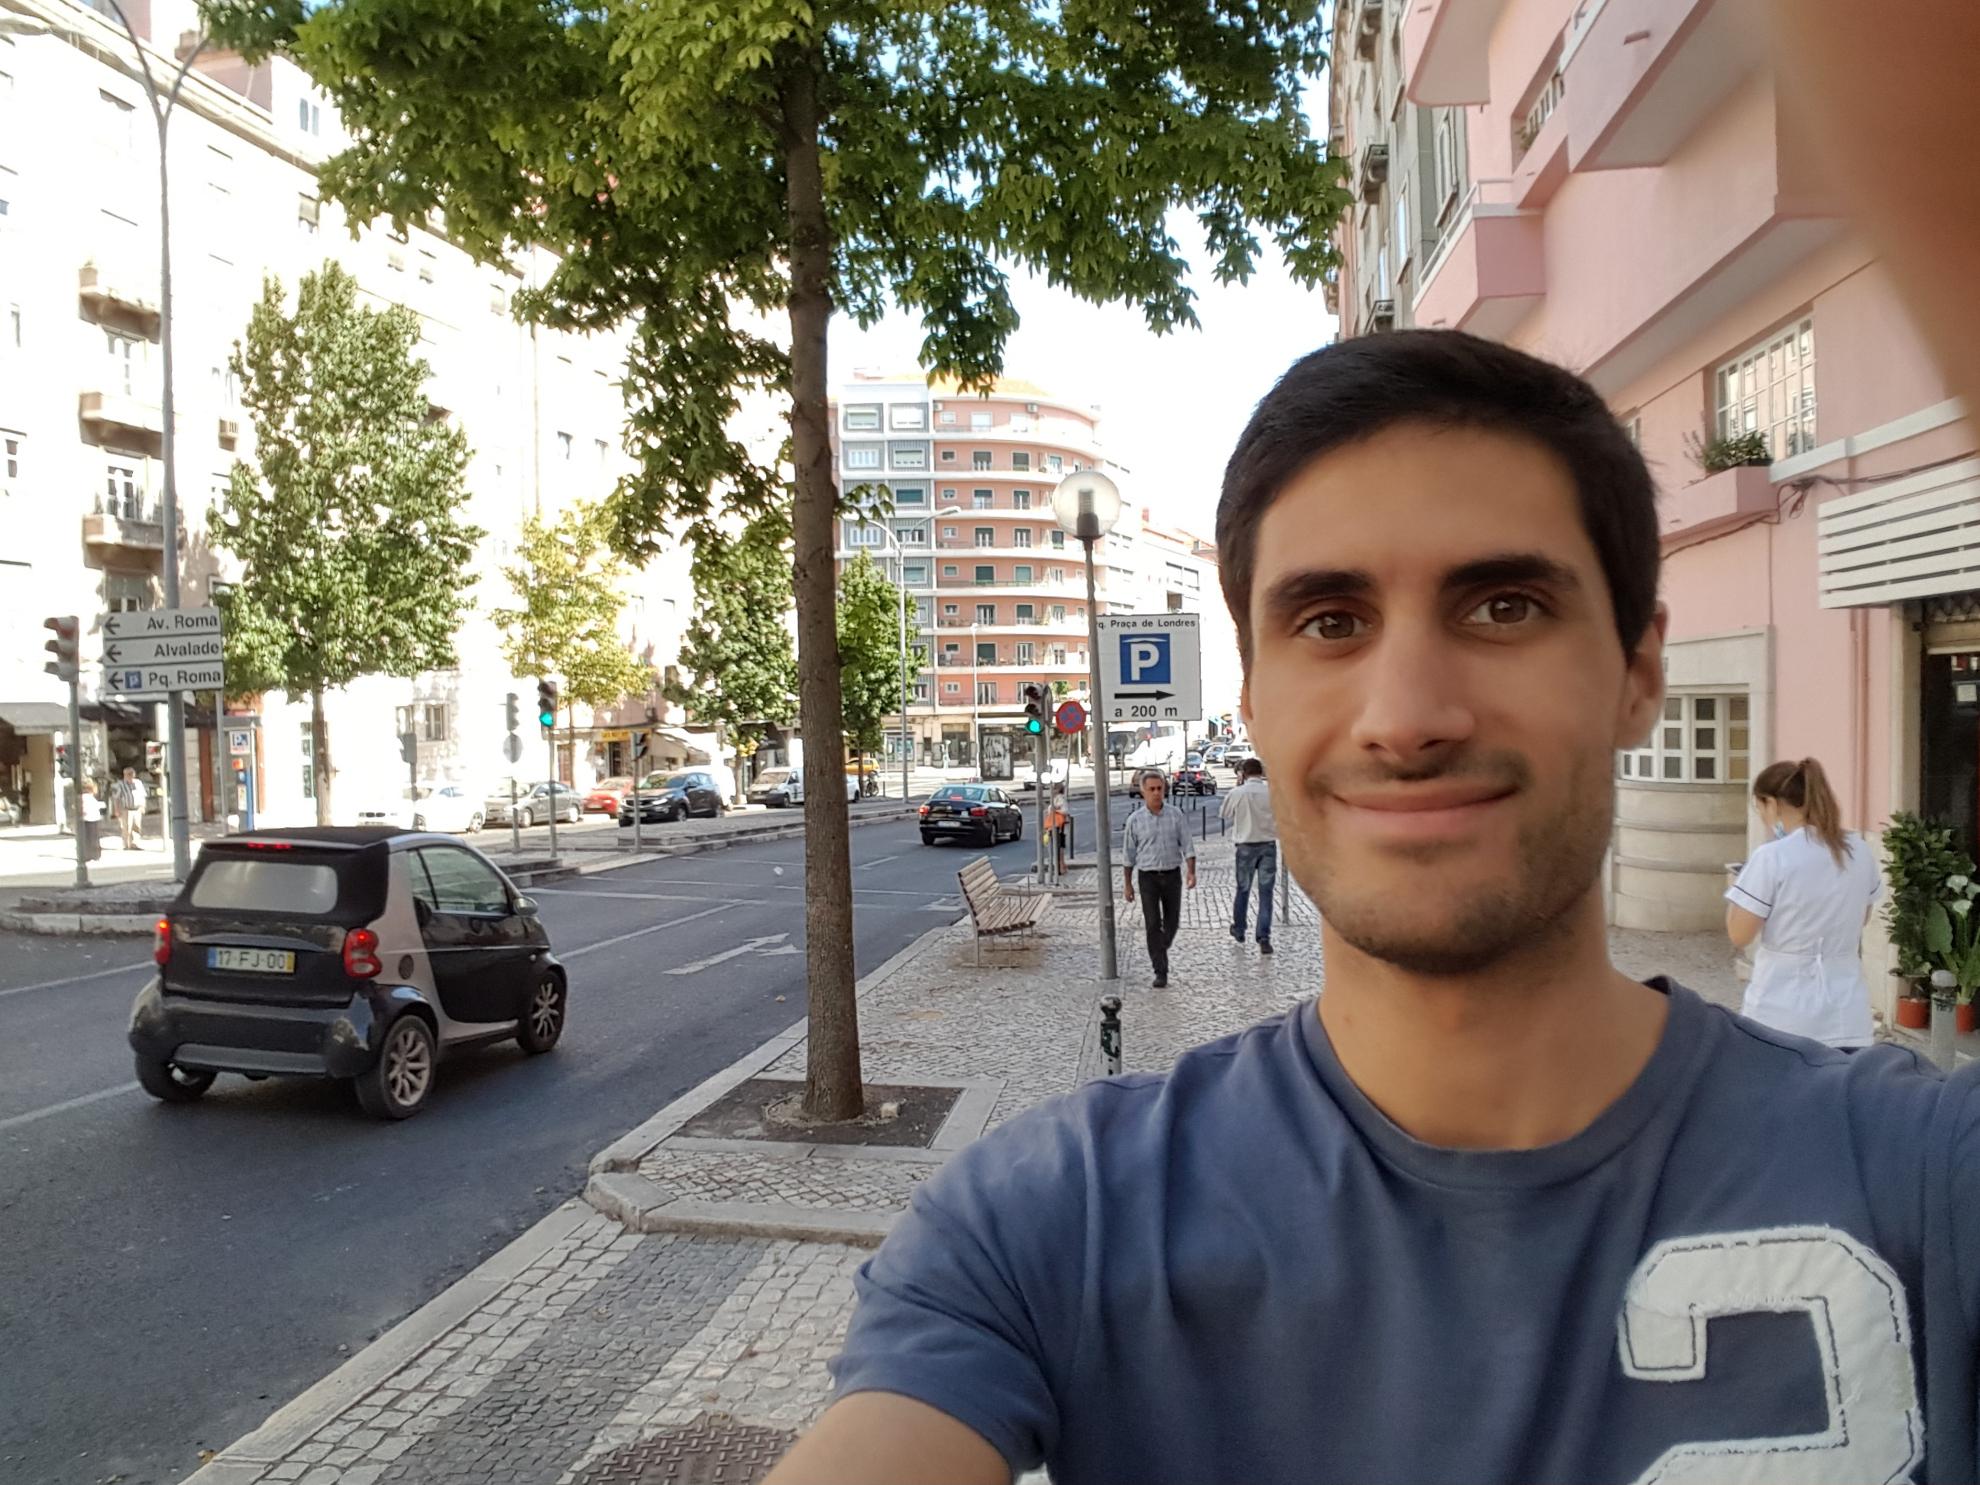 Selfie Samsung Galaxy S6 Edge+